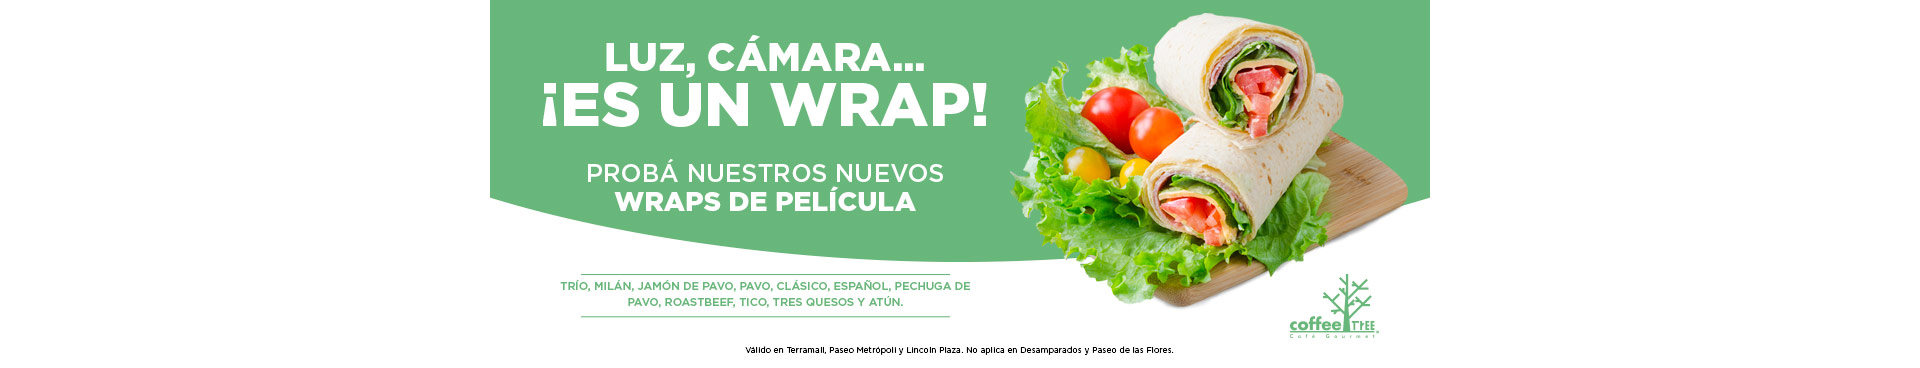 Promocion Wrap